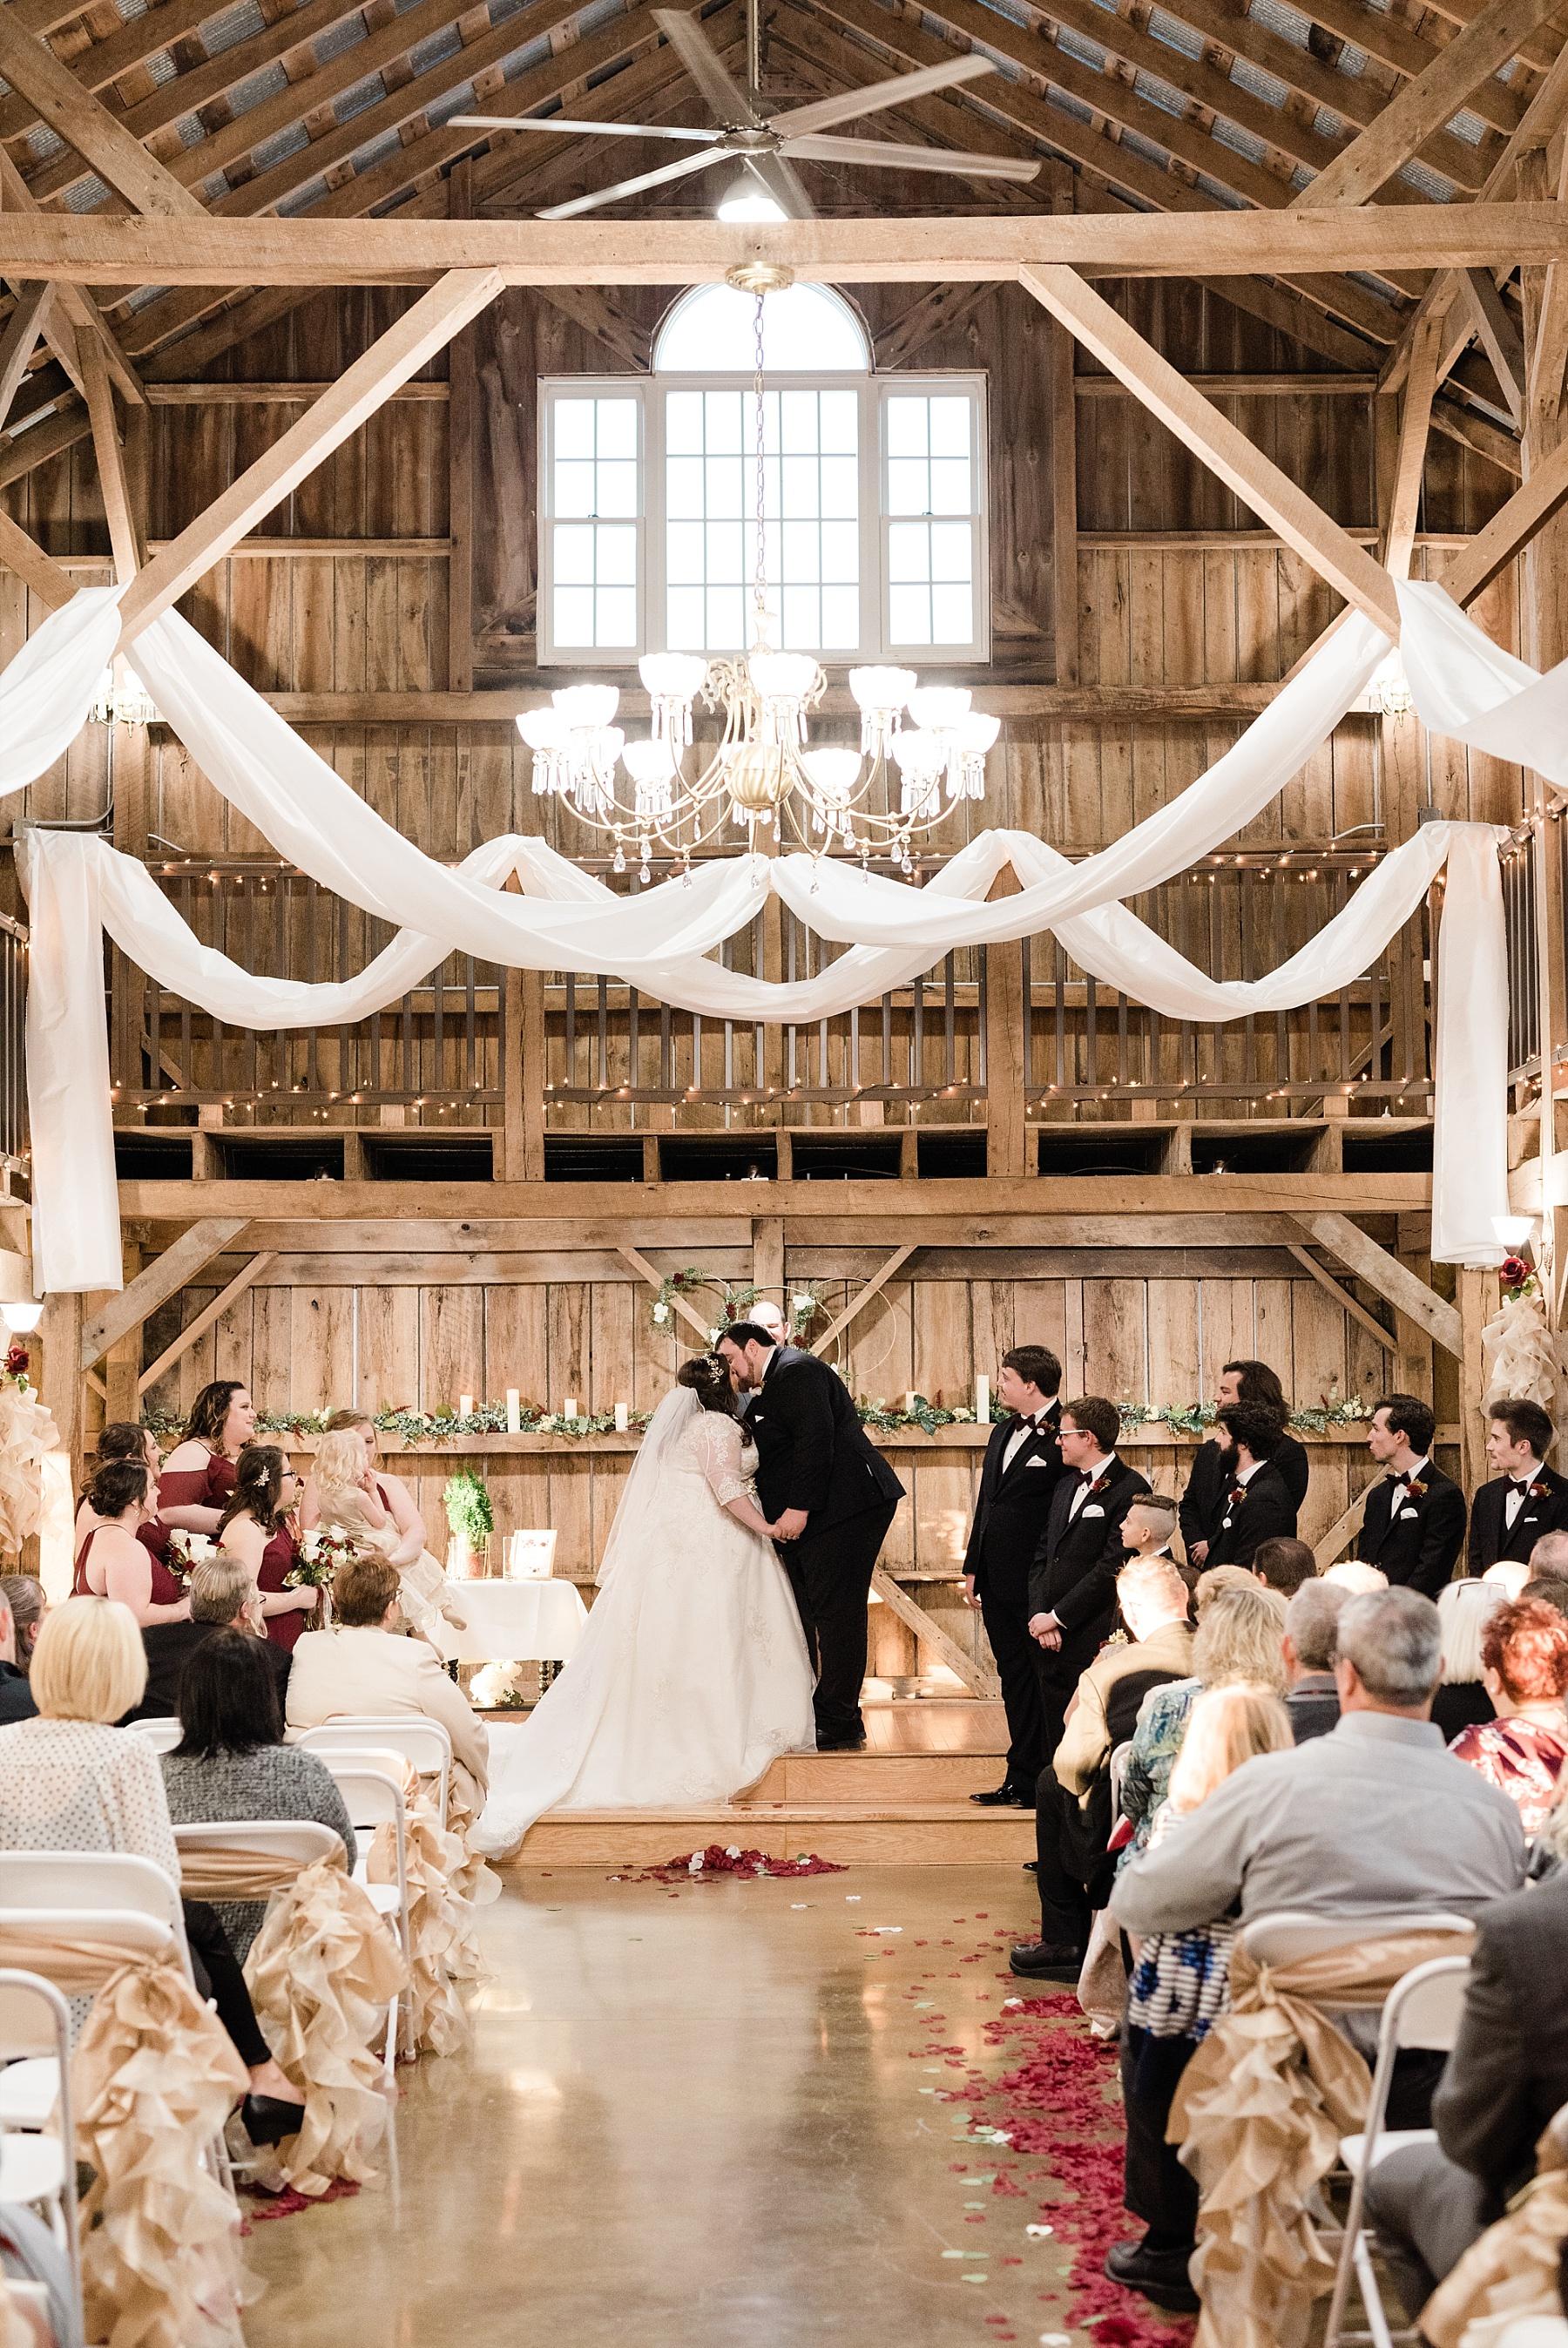 Golden Winter Wedding at The Legacy Barn in Barnett Missouri by Kelsi Kliethermes Photography Columbia Missouri Wedding Photographer_0019.jpg